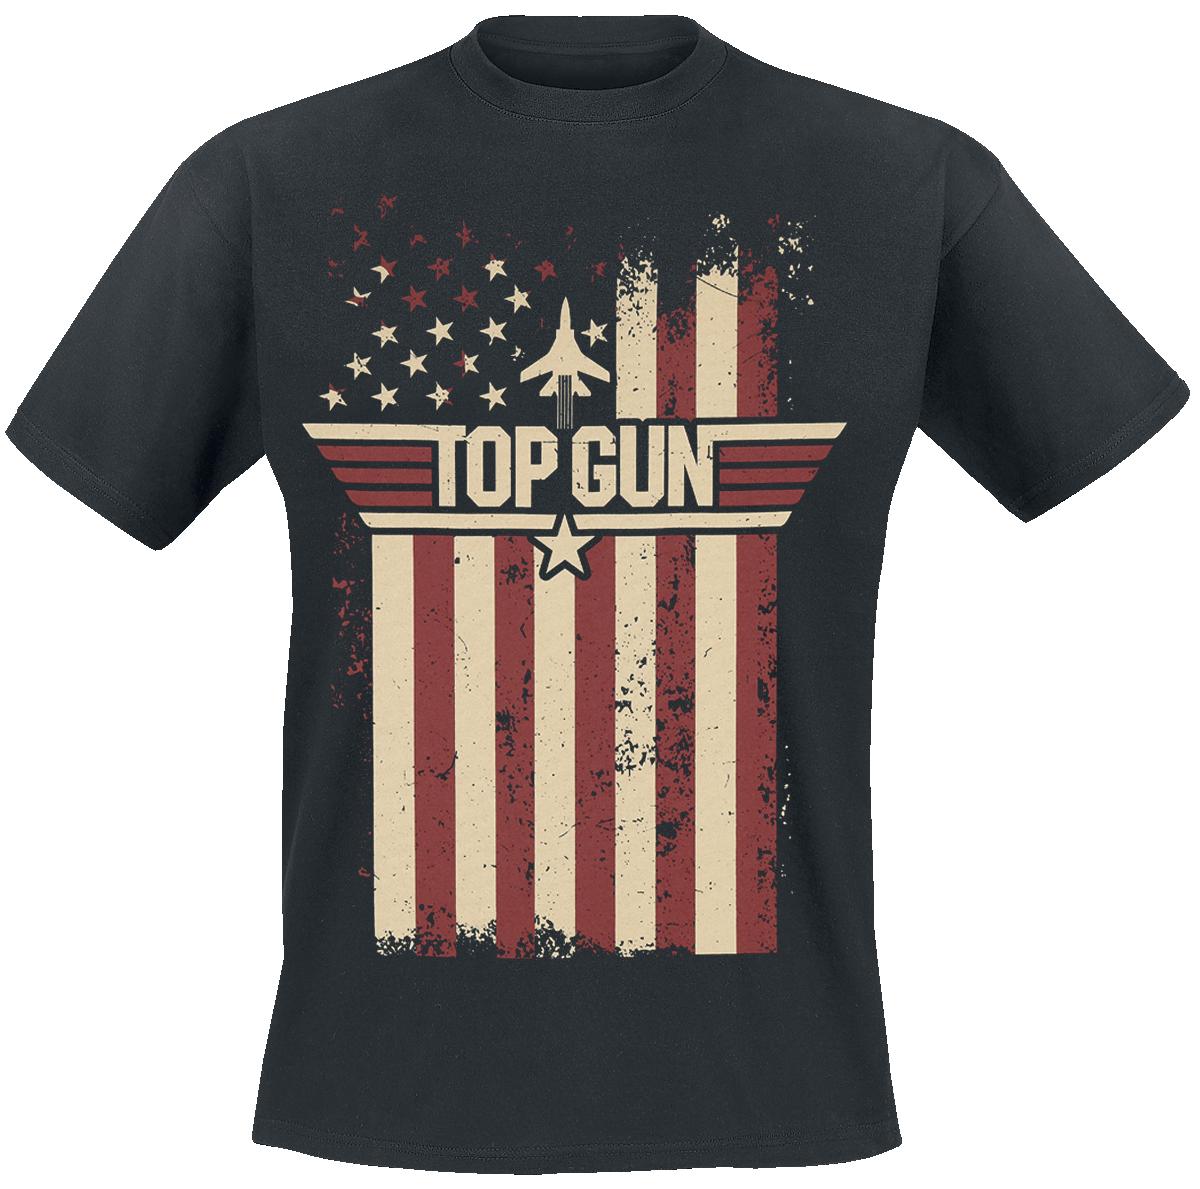 Top Gun - Flag - T-Shirt - black image